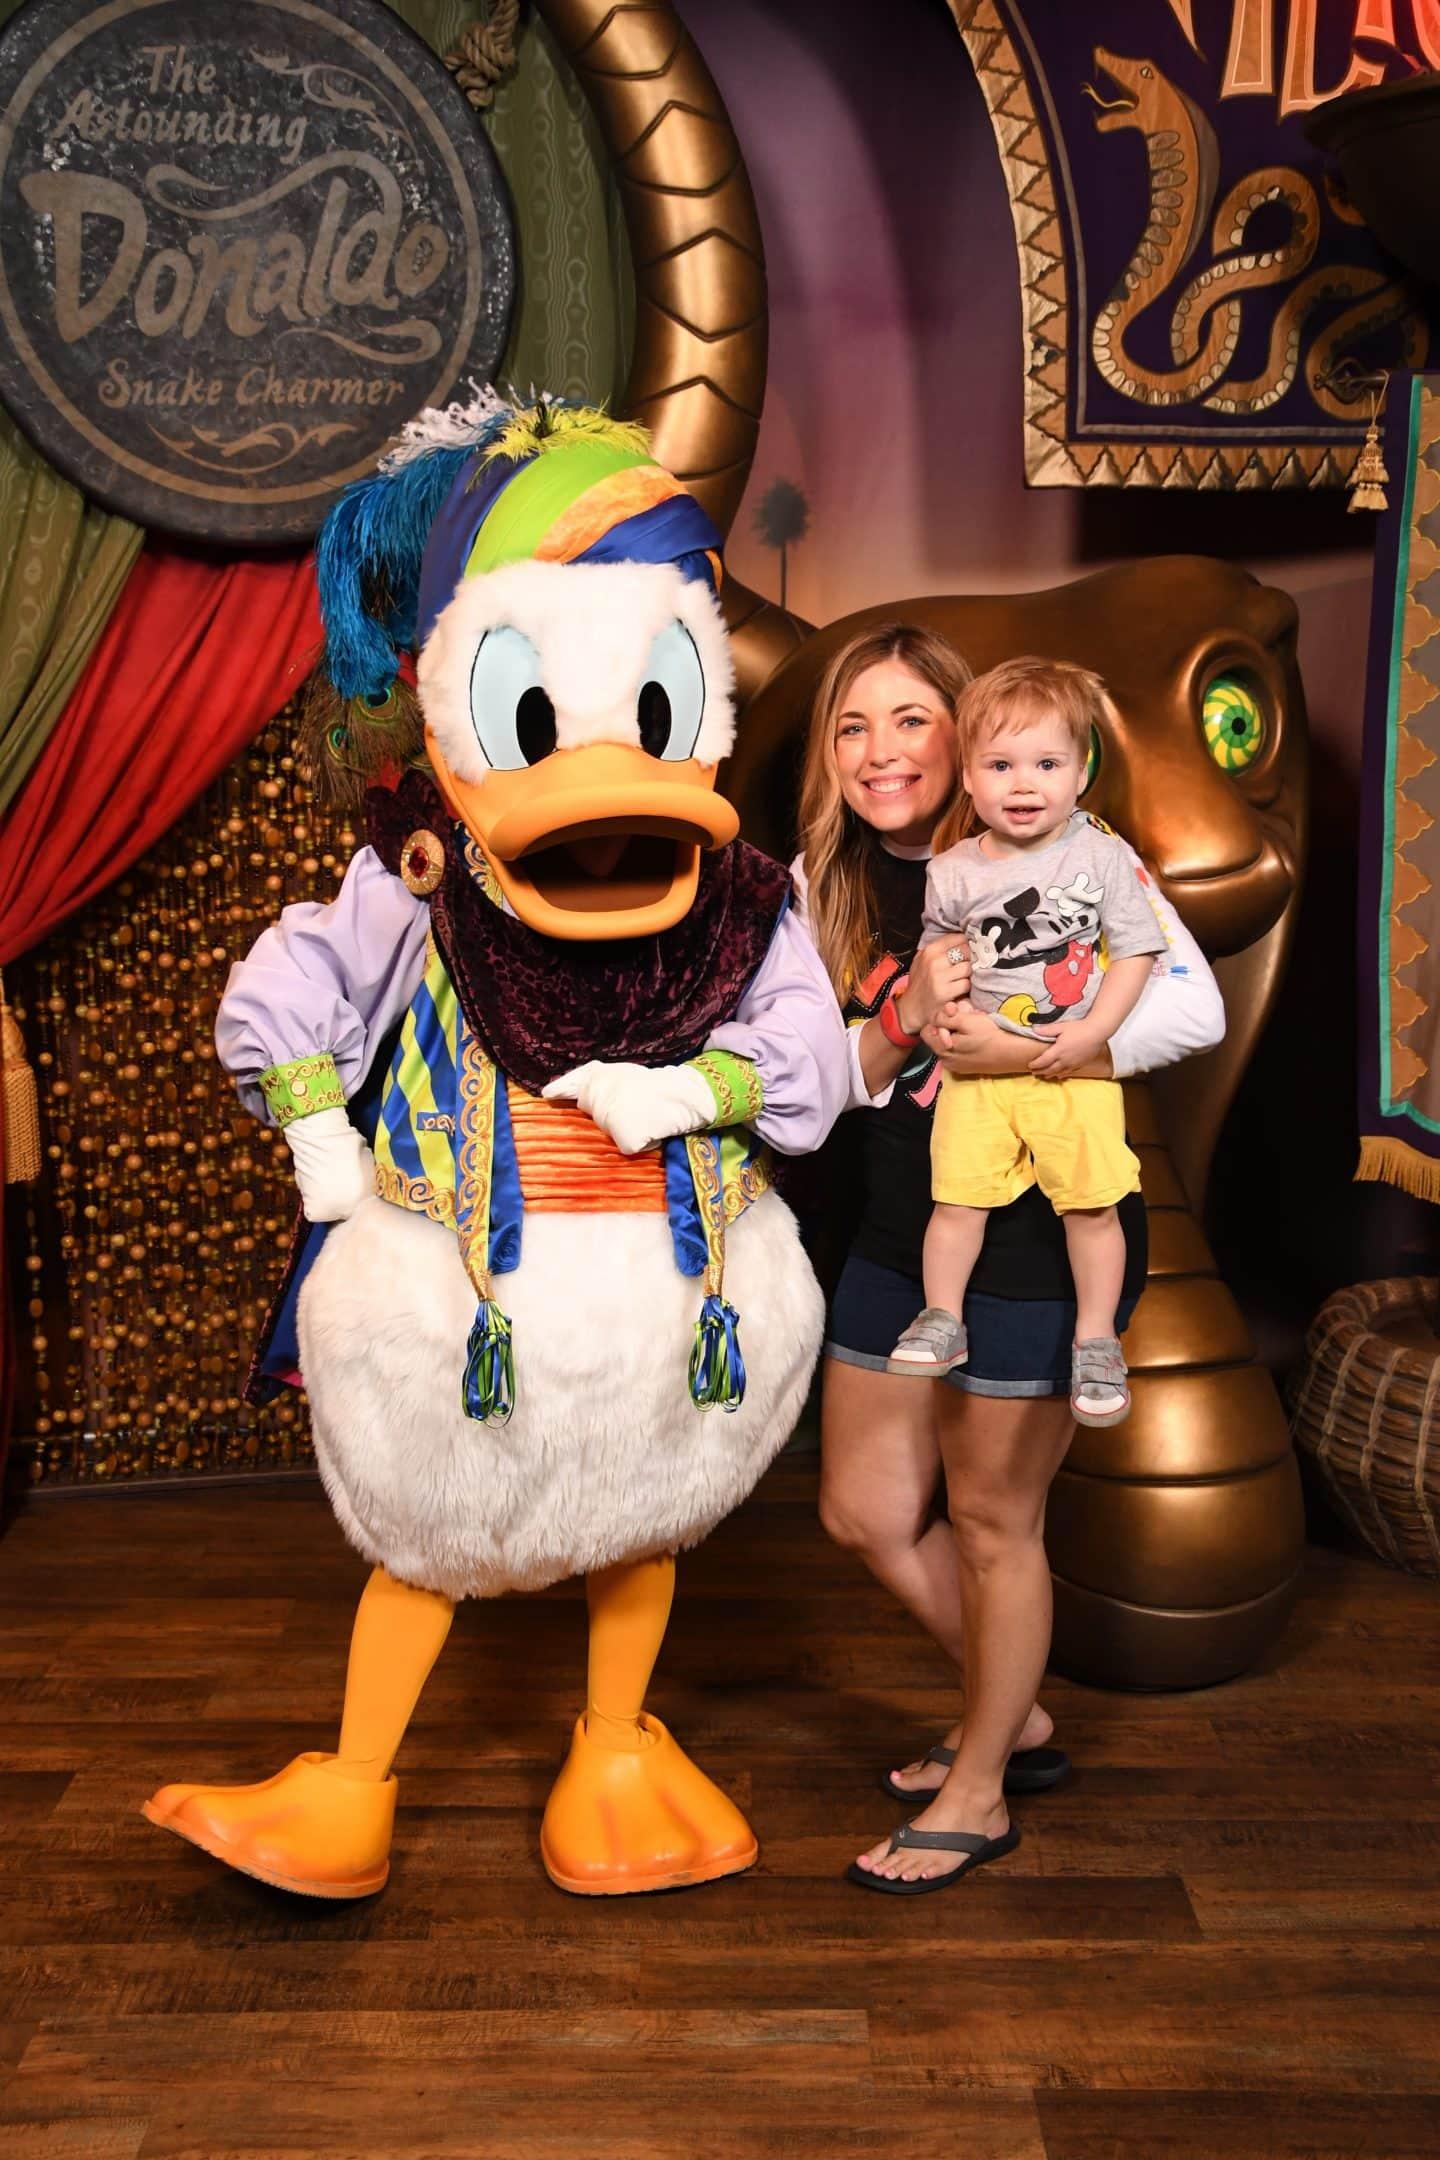 toddler boy meeting Donald Duck at magic kingdom Disney World